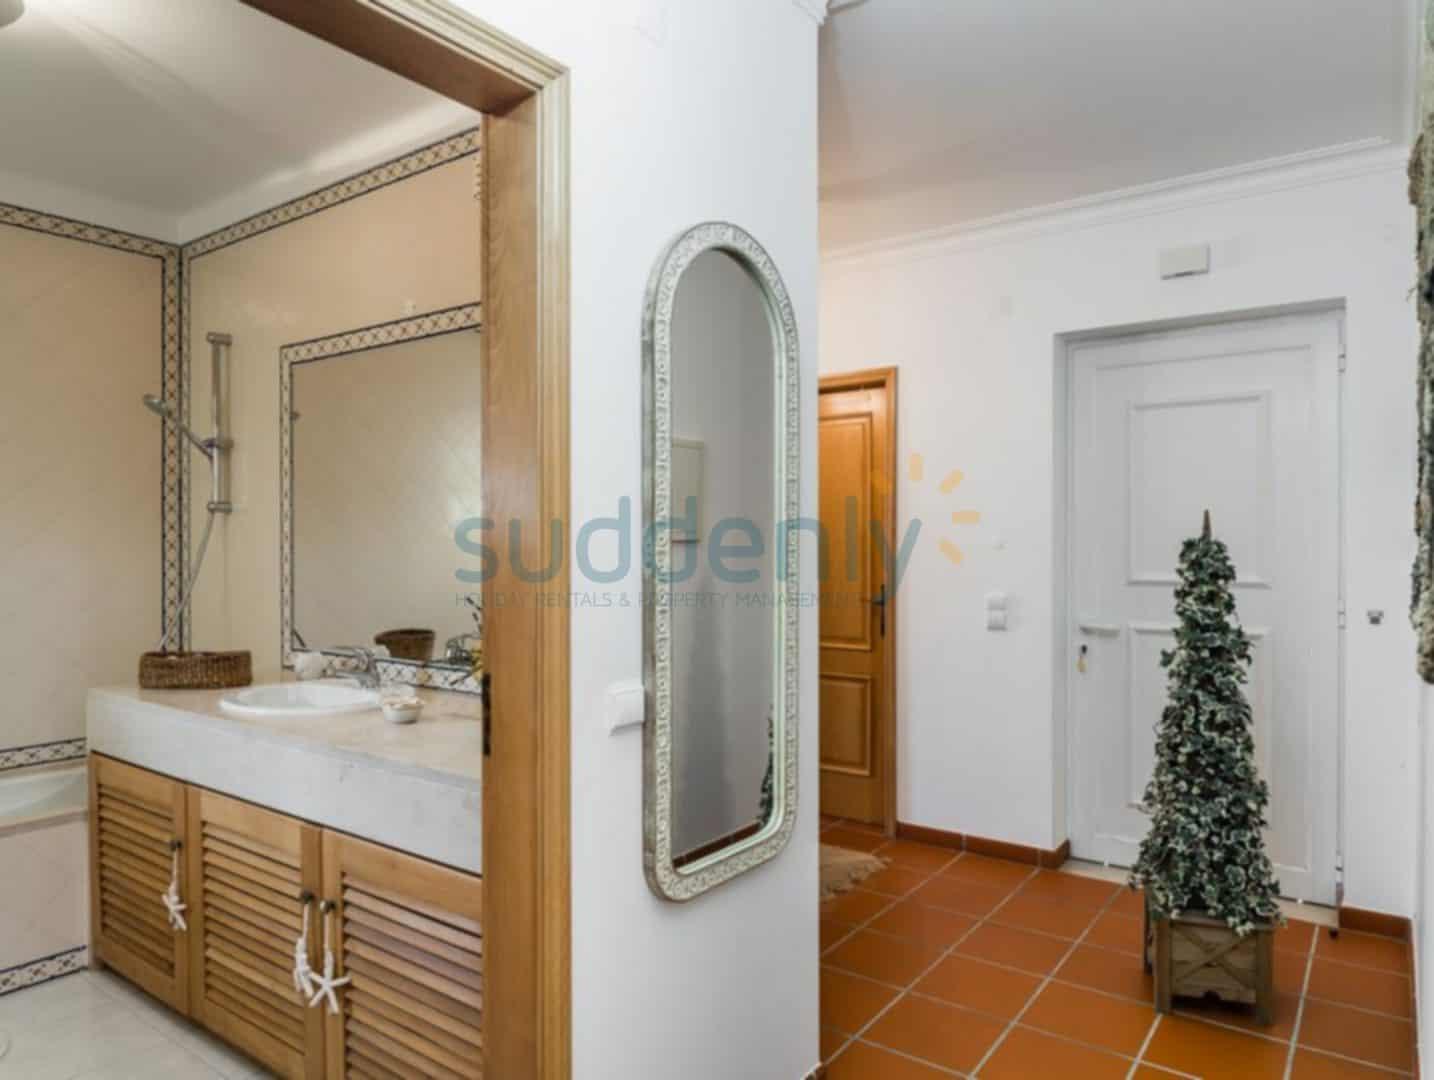 Villas 167